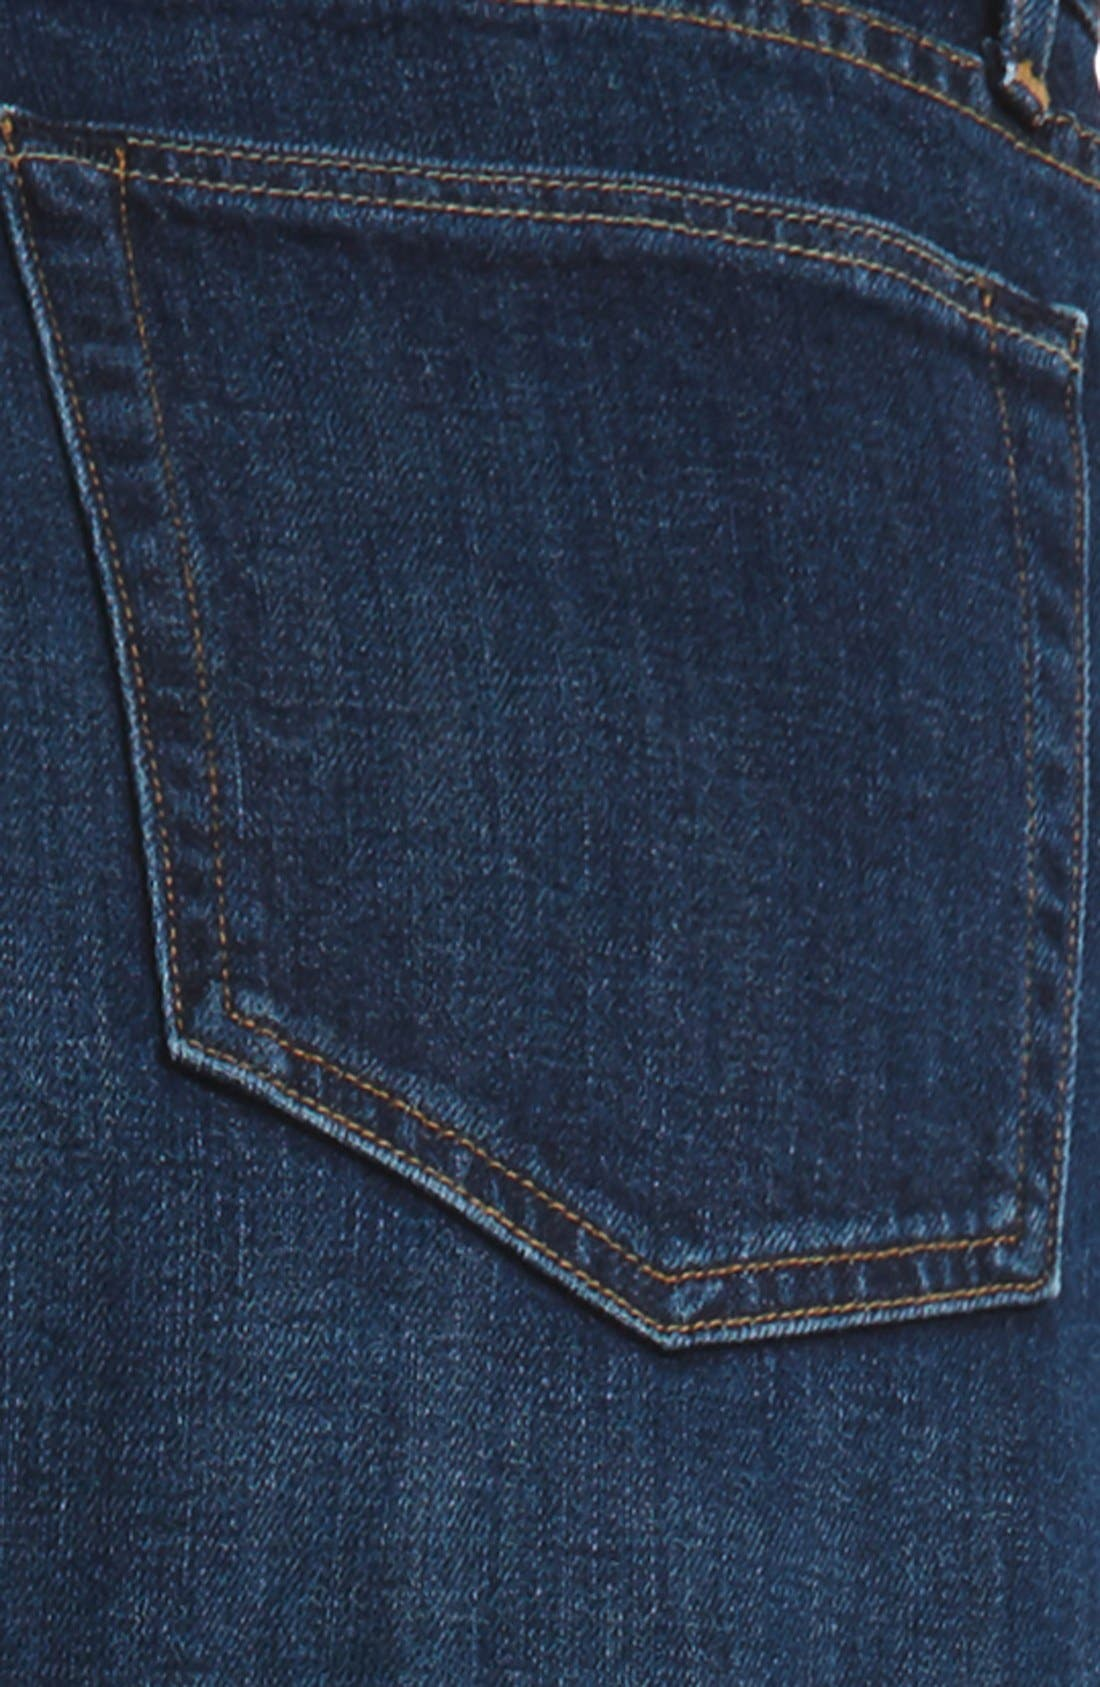 Brit Straight Leg Jeans,                             Alternate thumbnail 3, color,                             404